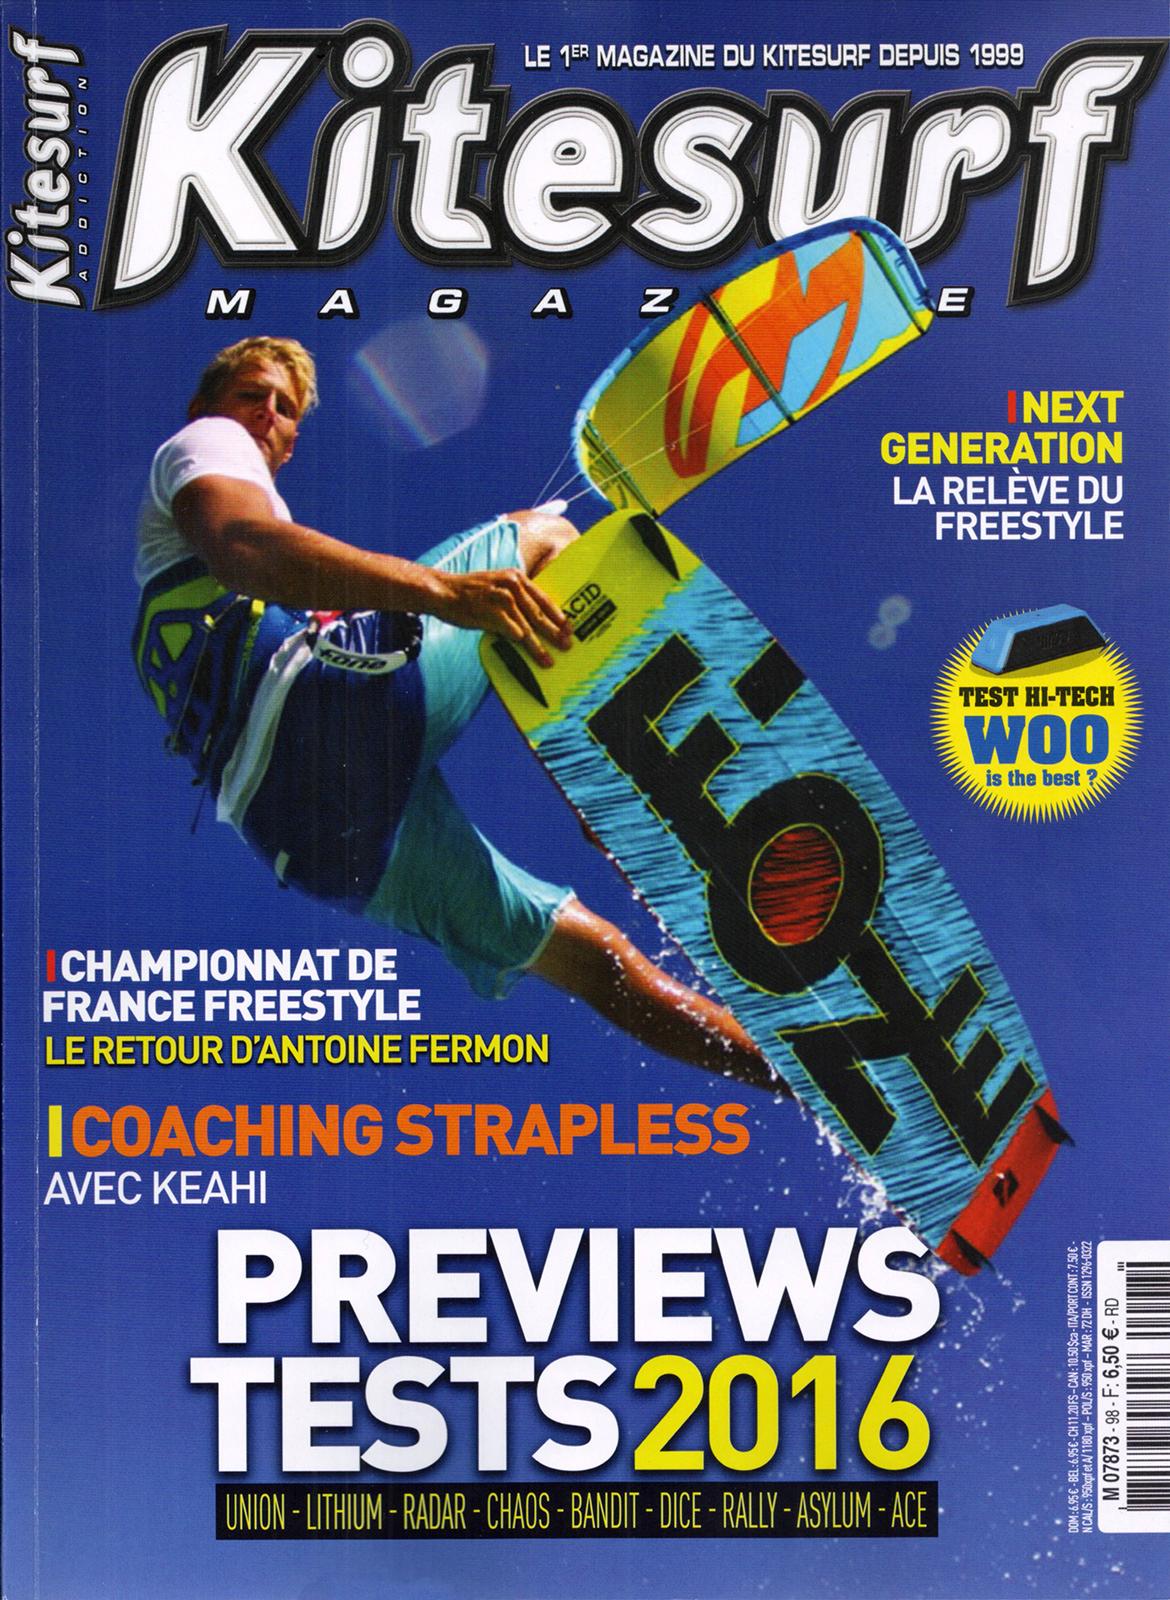 Kitesurf Magazine fait l'article sur le TKC2015